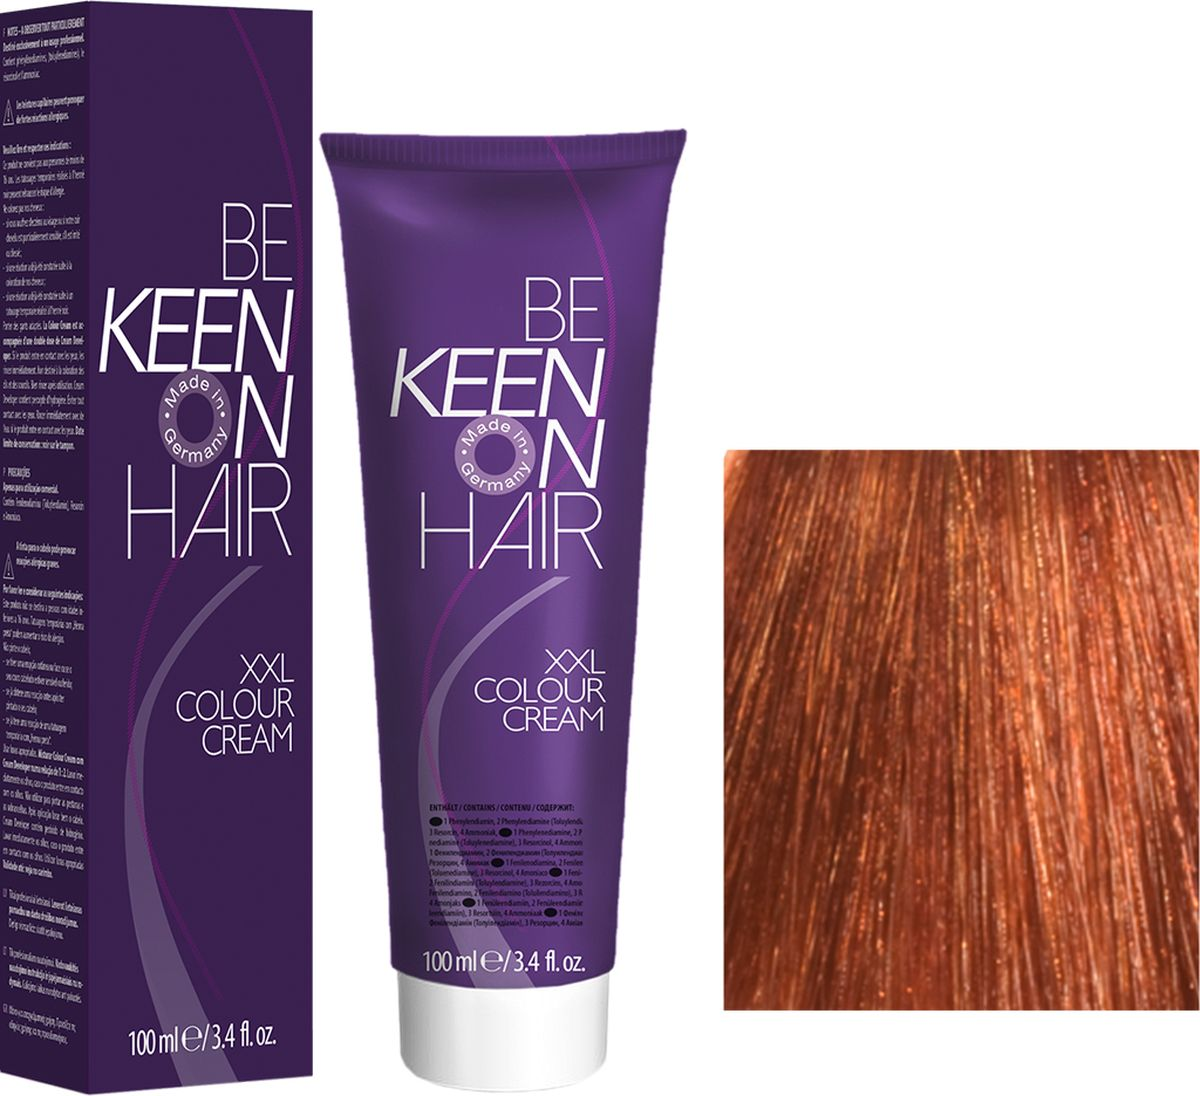 Keen Краска для волос 8.4 Медный блондин Blond Kupfer, 100 мл